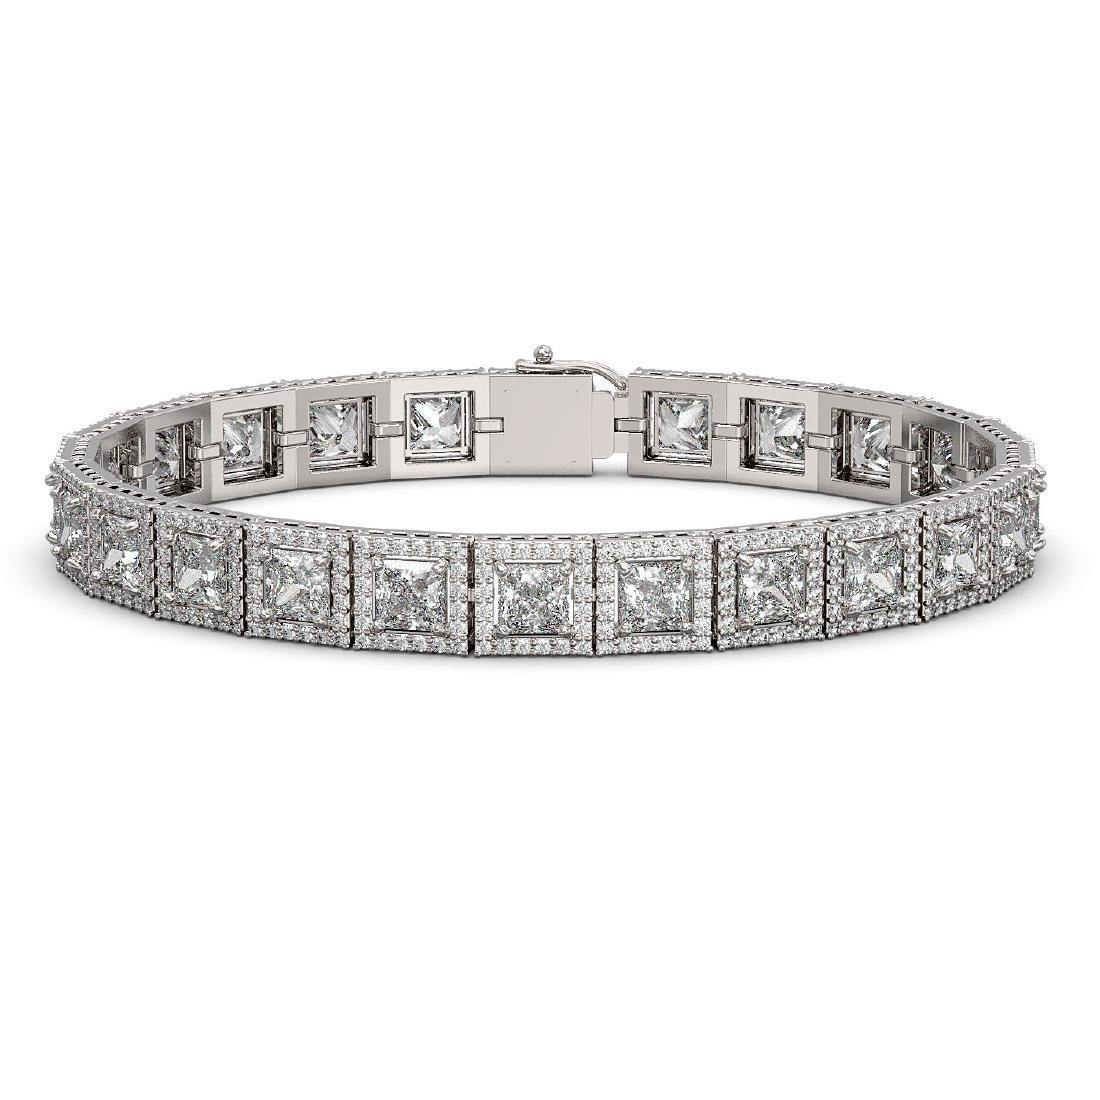 15.87 CTW Princess Diamond Designer Bracelet 18K White